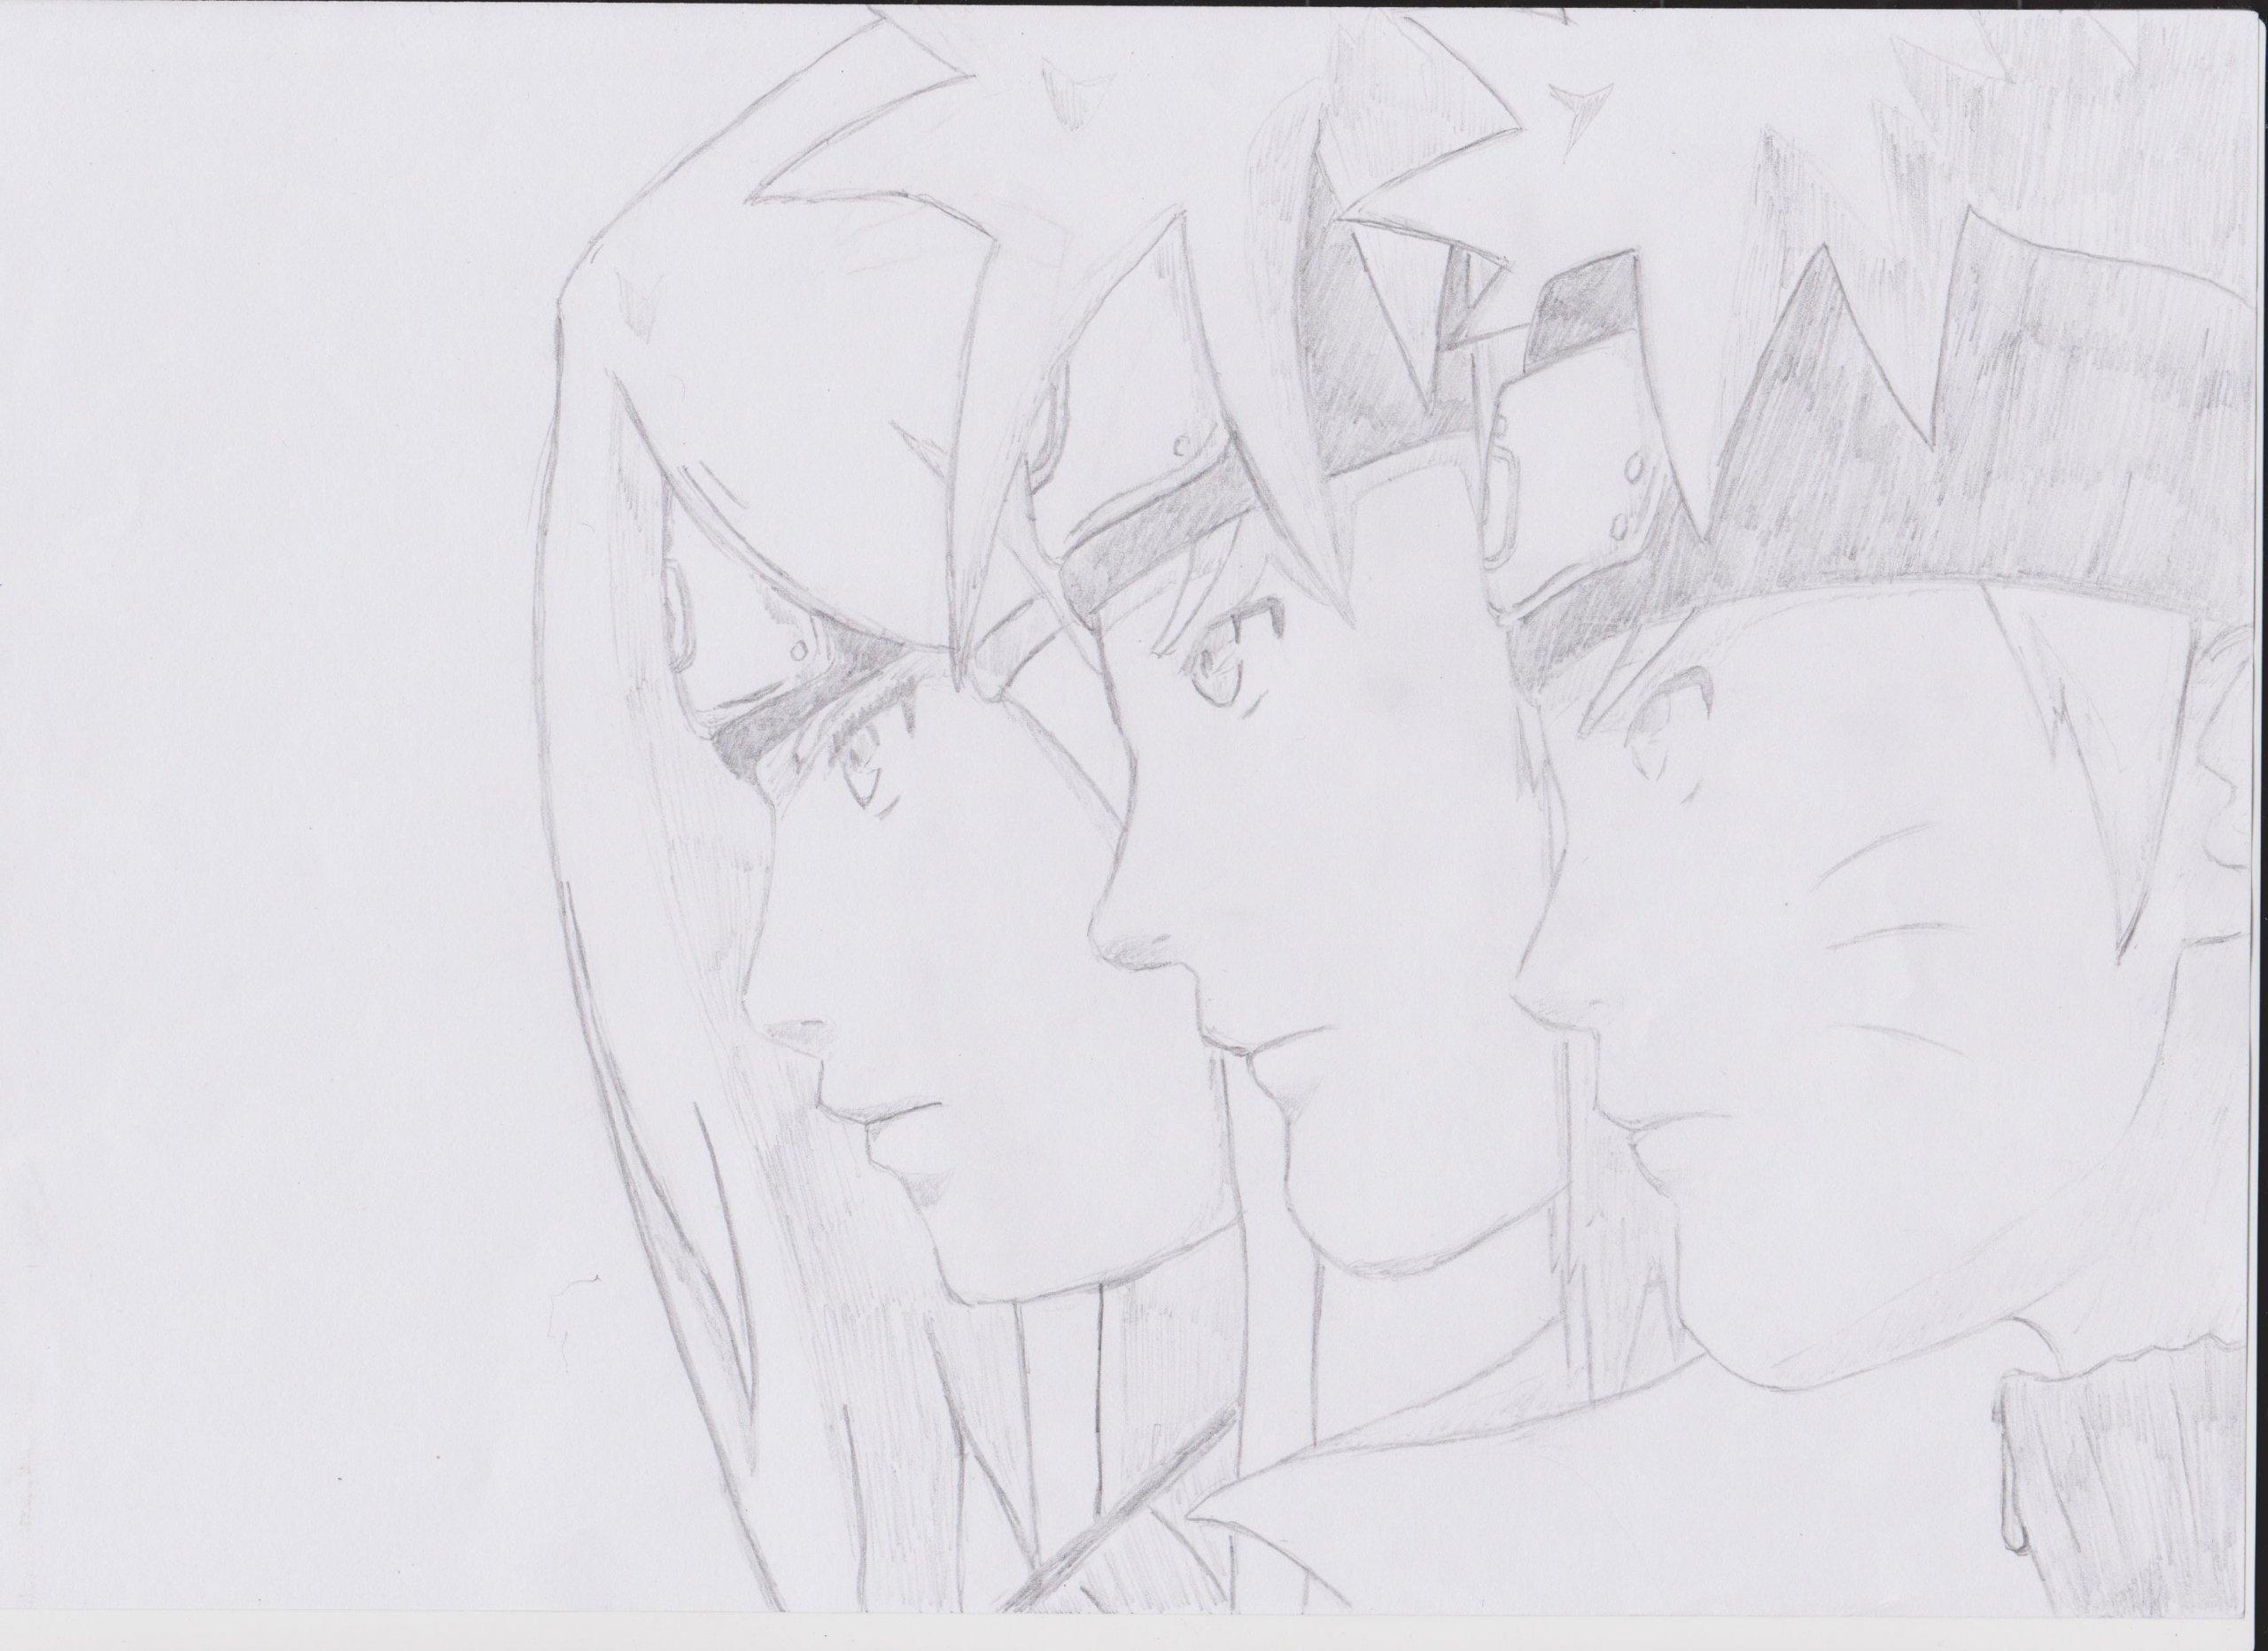 Fonds d'écran Art - Crayon Manga - Naruto naruto, minato, kushina ; Une lignée d'exception :D